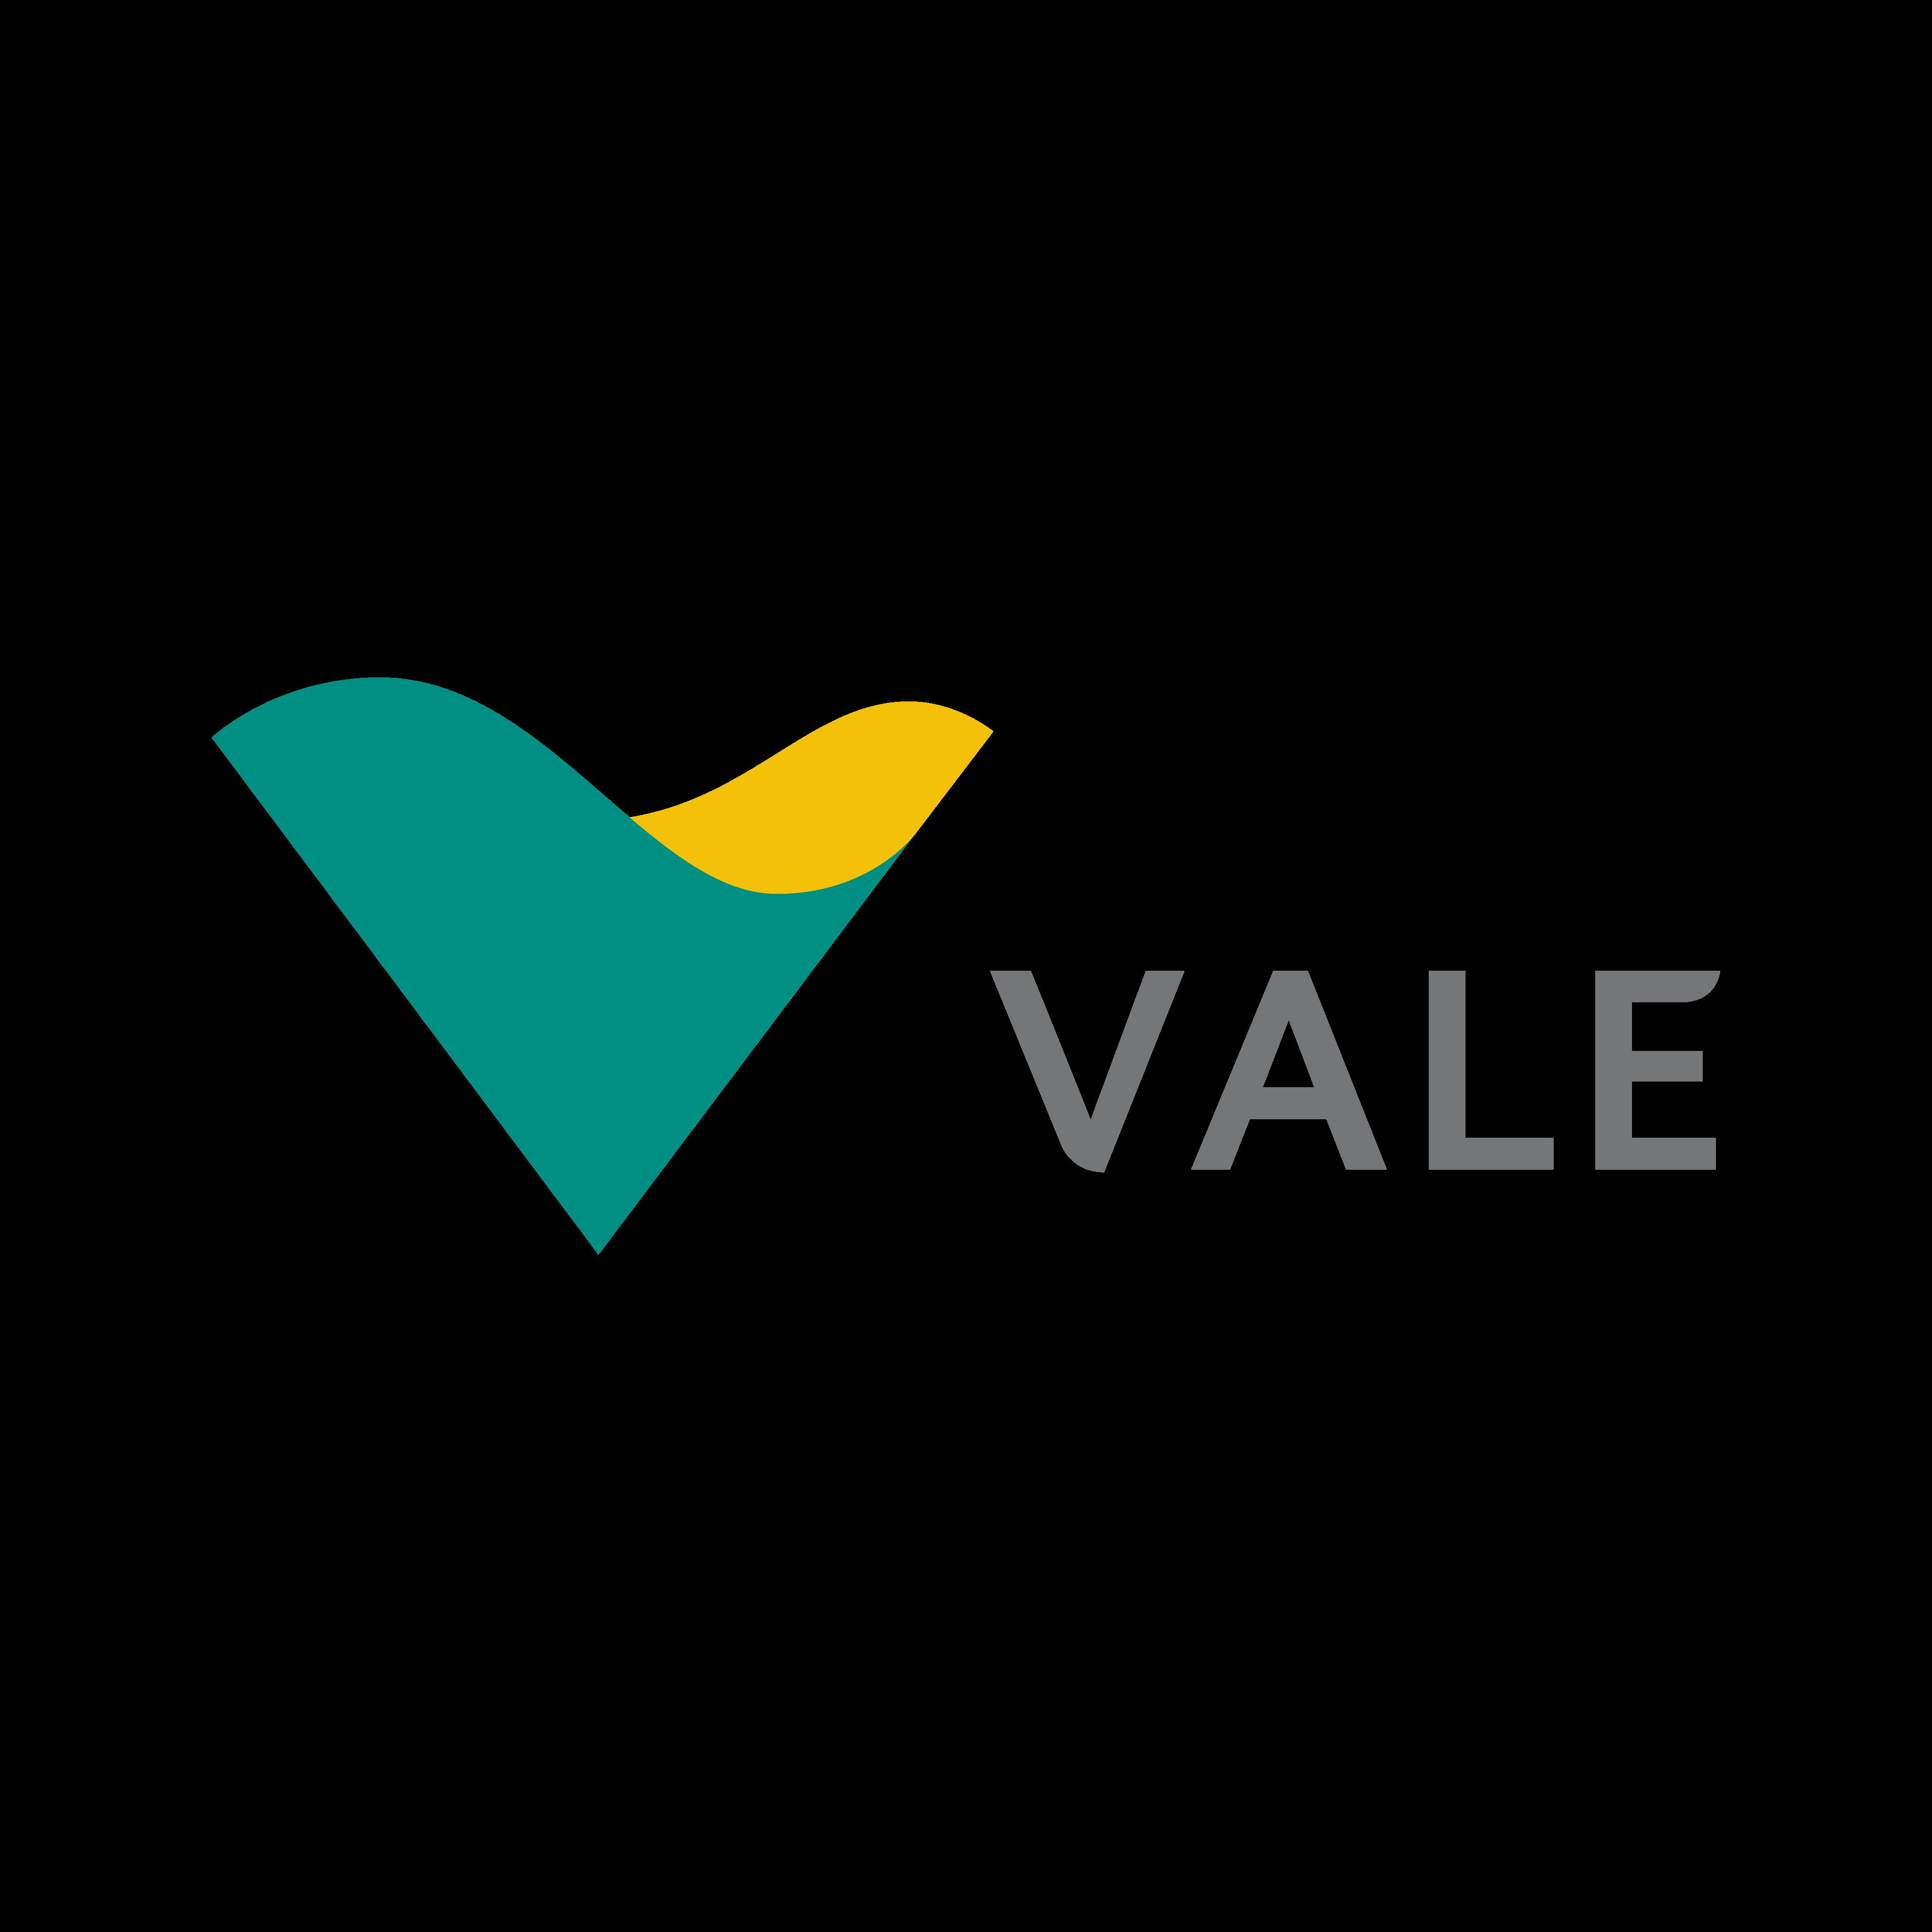 vale logo 0 - Vale Logo - Mineradora